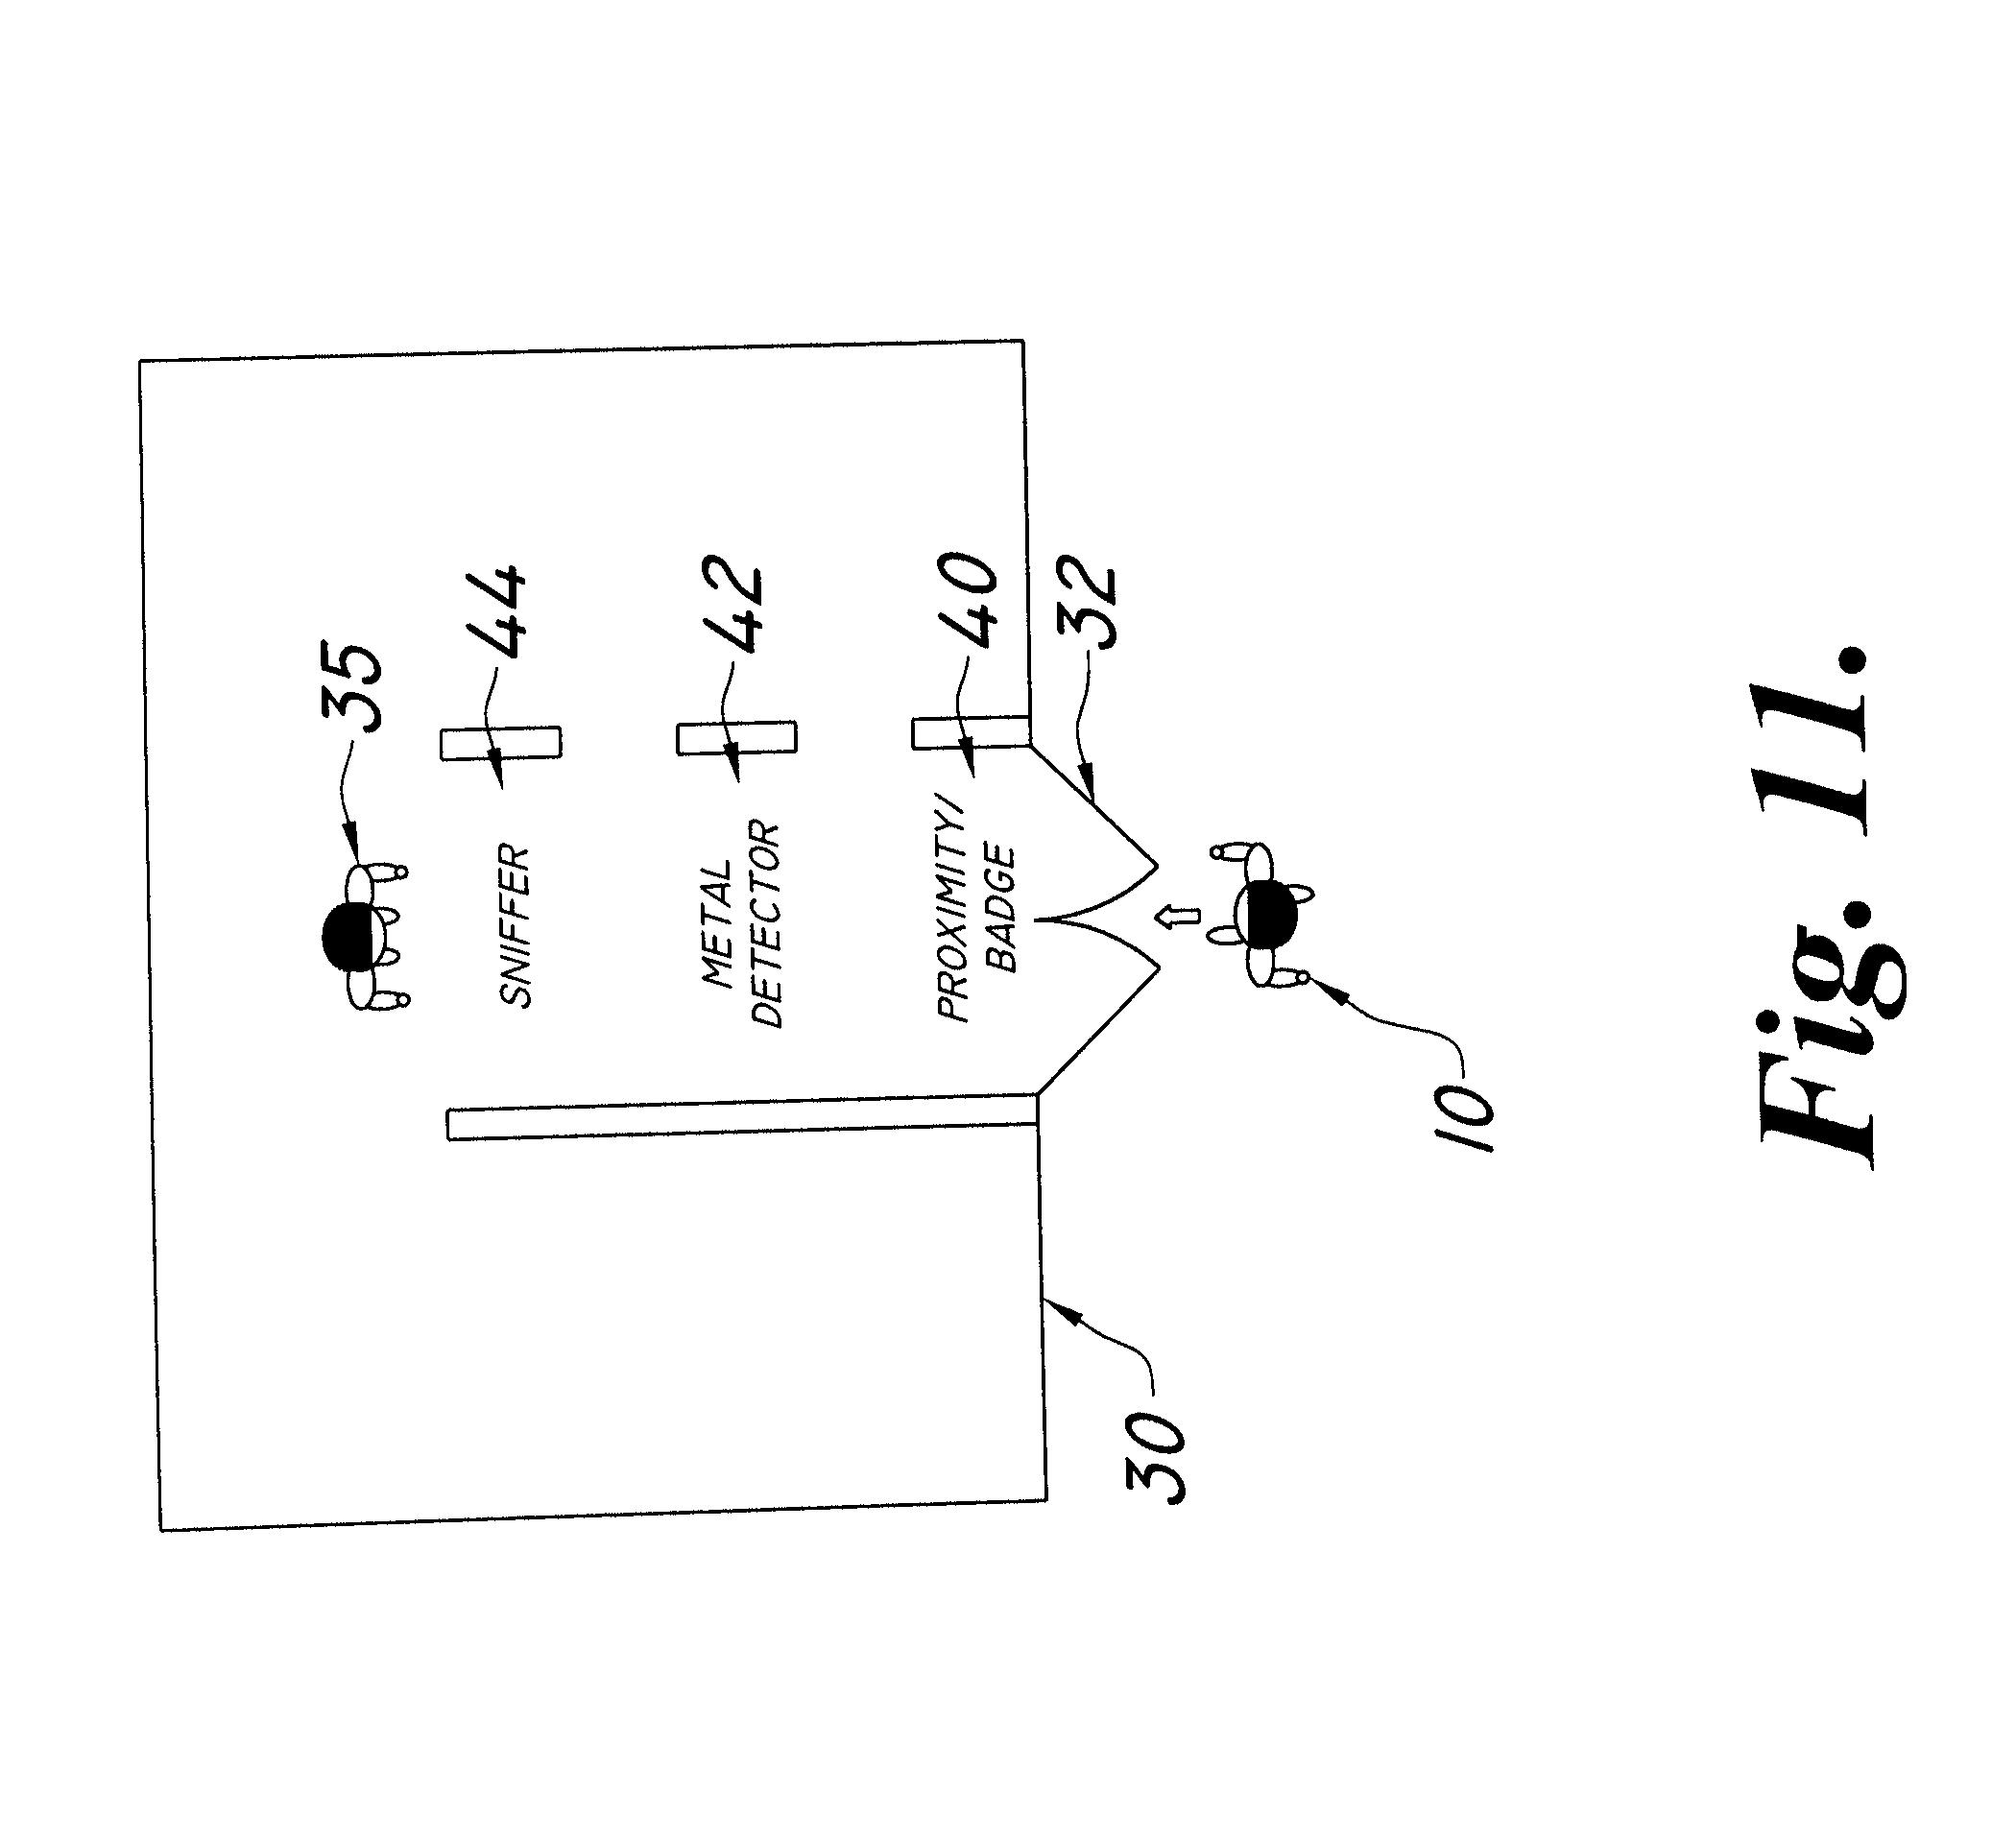 microphone amplifier circuit diagram tradeoficcom